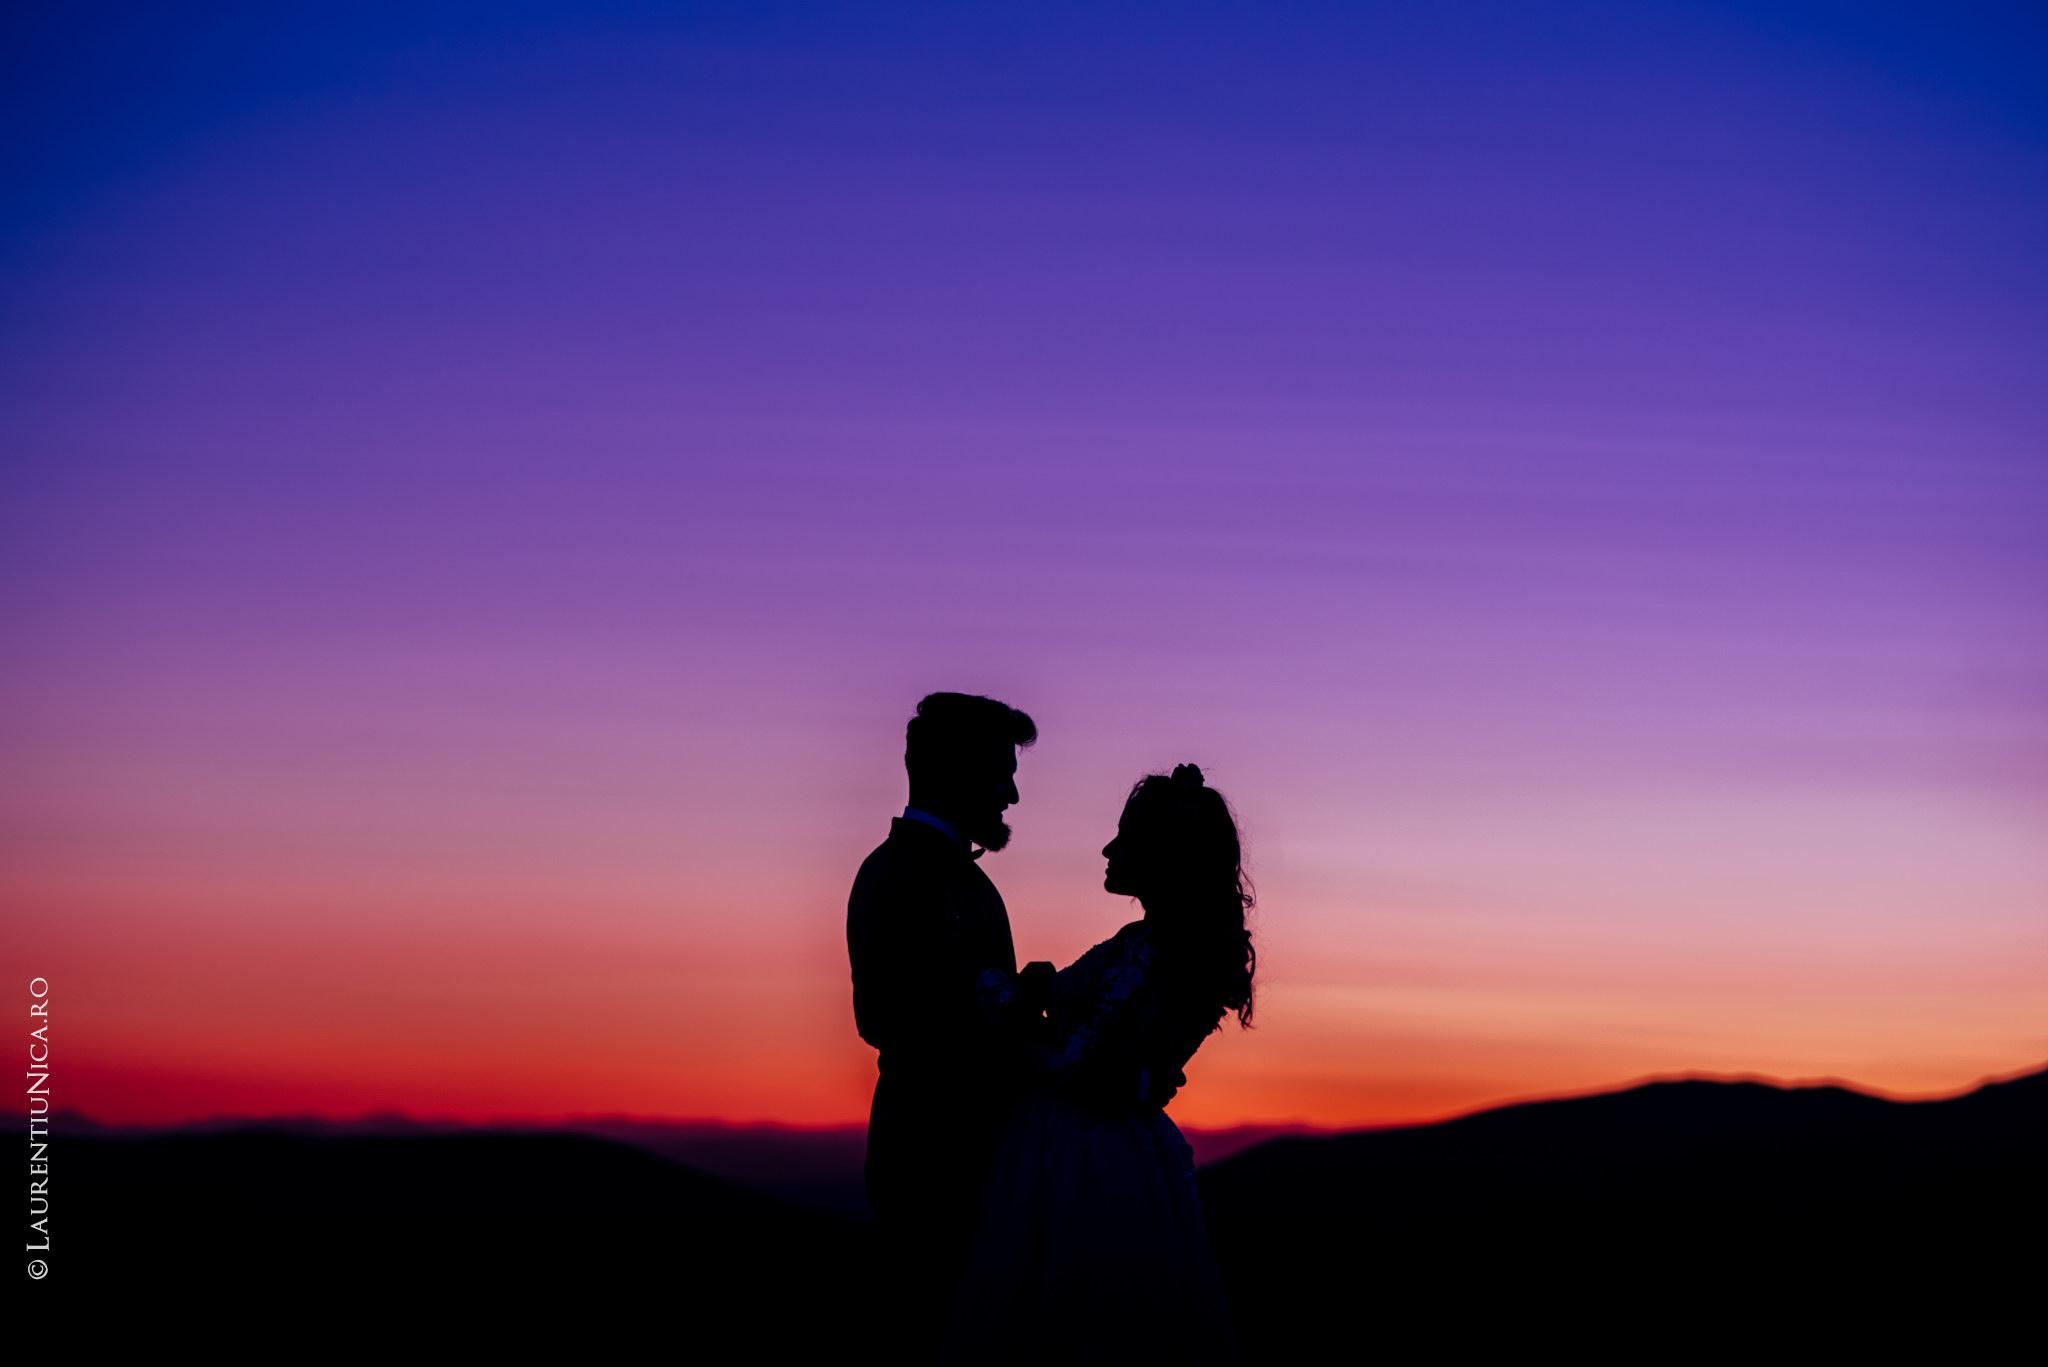 aida si alin fotograf nunta laurentiu nica transalpina 30 - Aida & Alin | Fotografii After Wedding | Transalpina - Muntii Parang